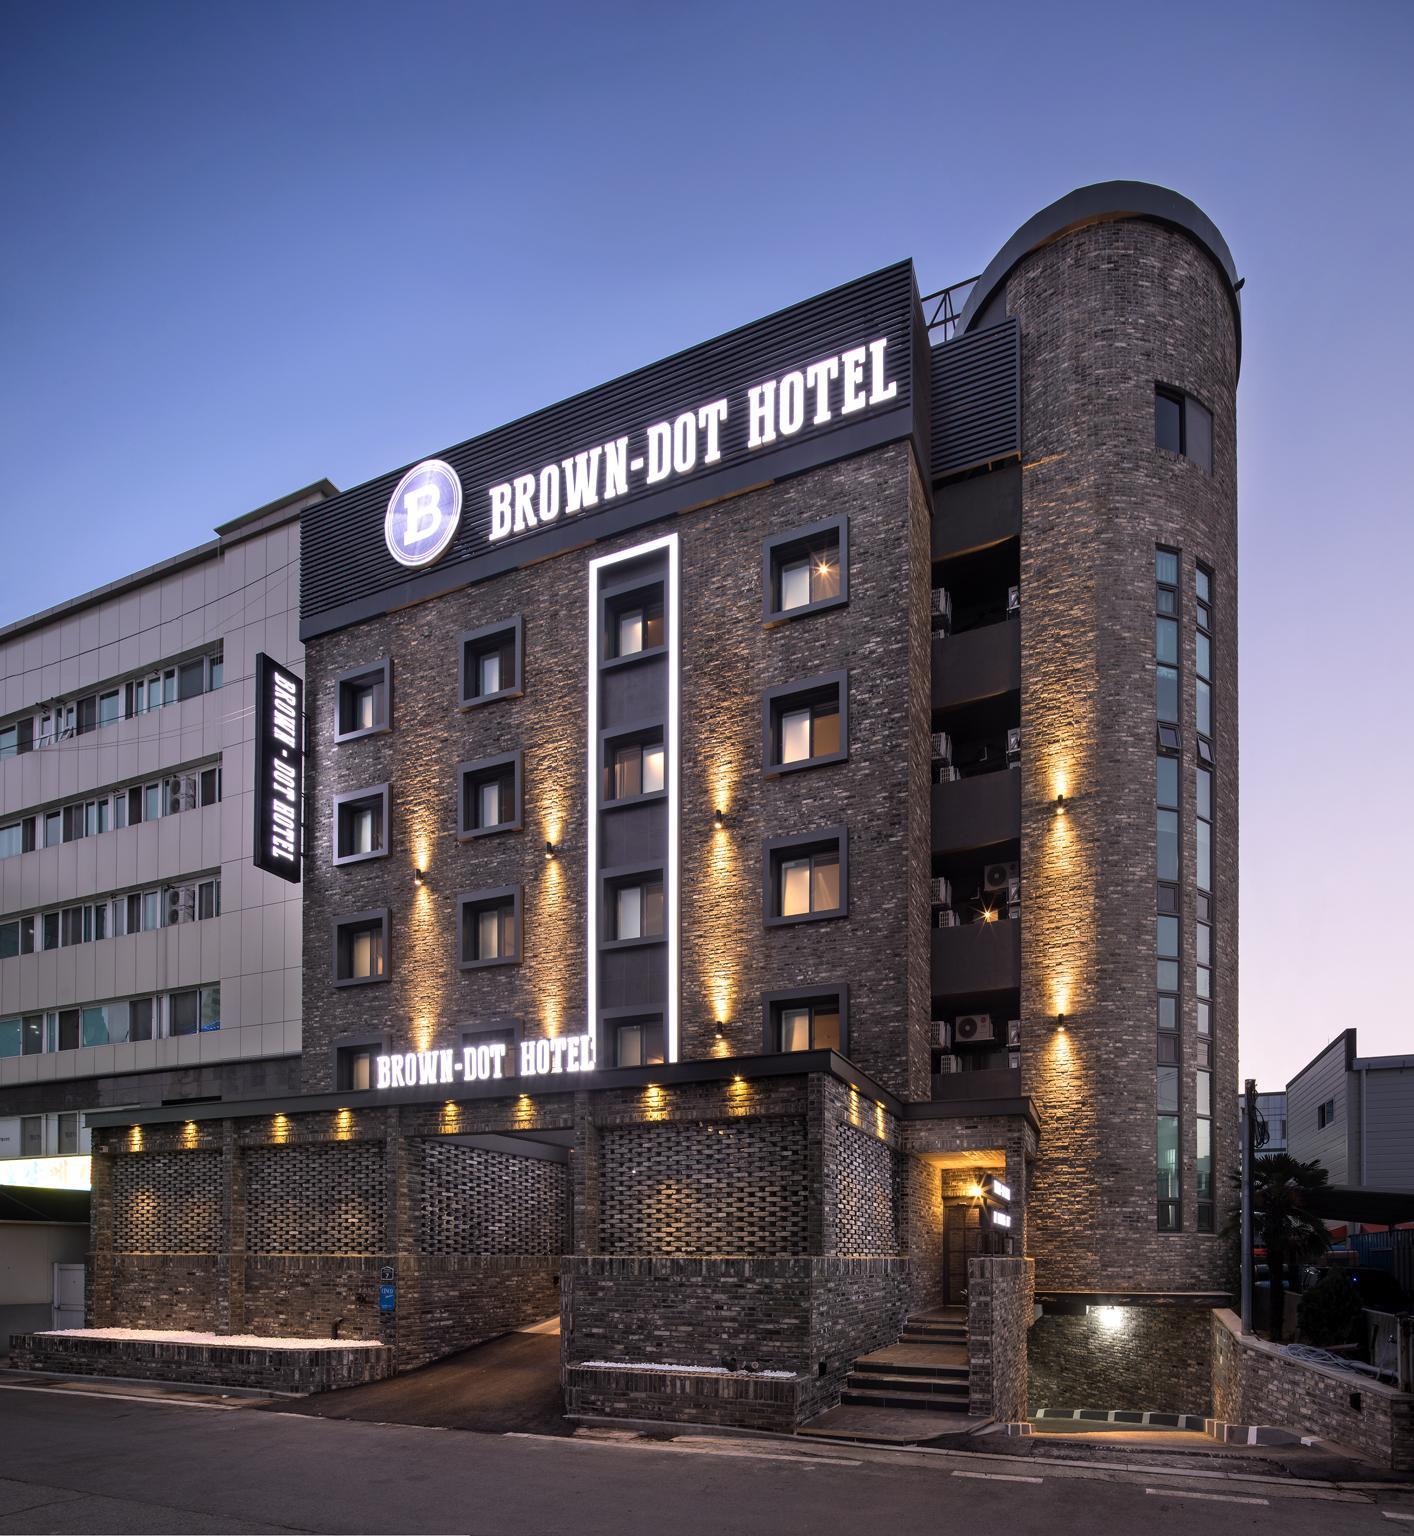 Changwon Brown-dot Hotel Myeongseo, Changwon